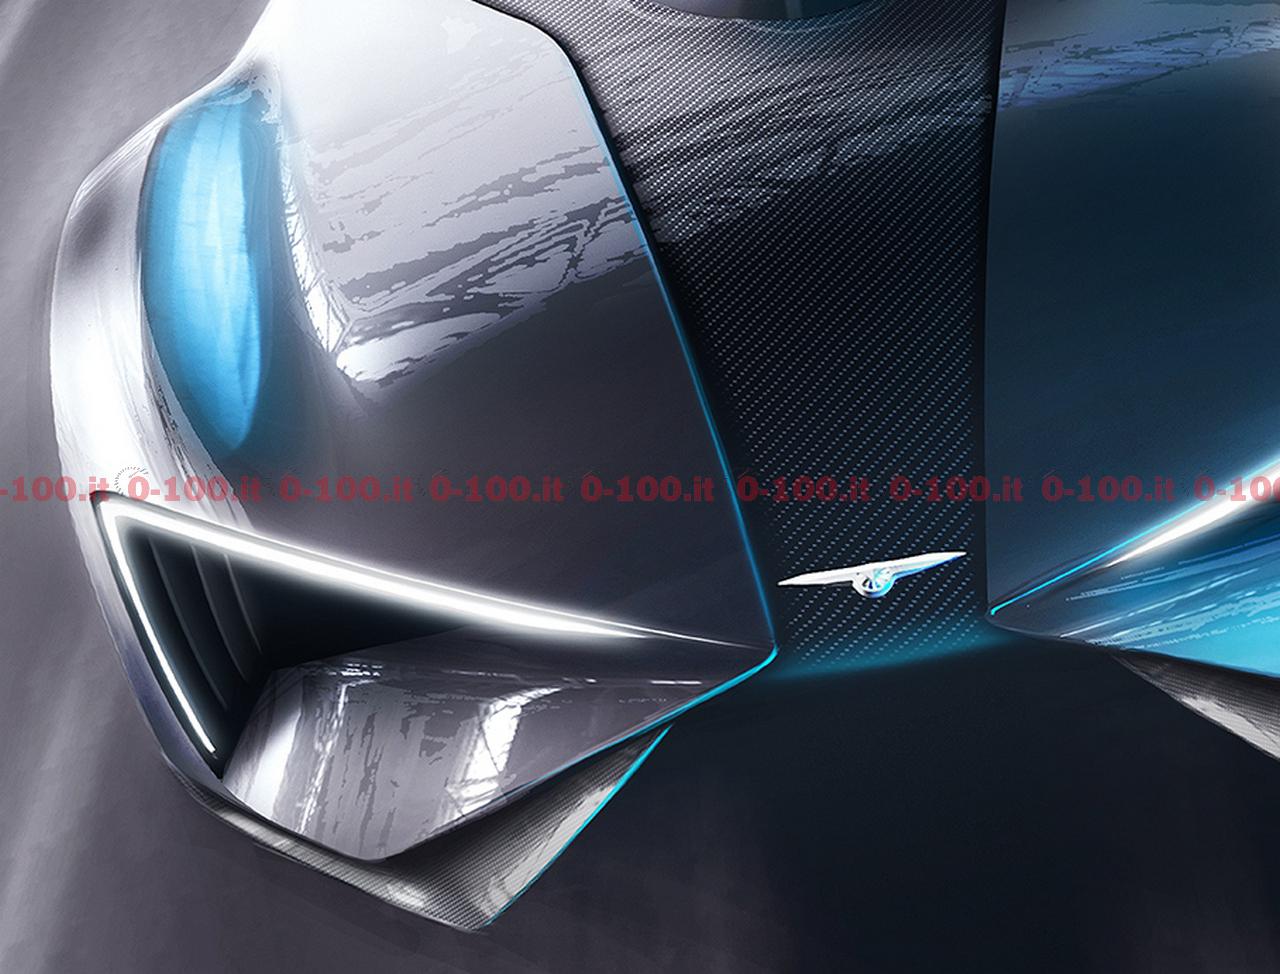 techrules_Turbine-Recharging-Electric-Vehicle_0-100_8